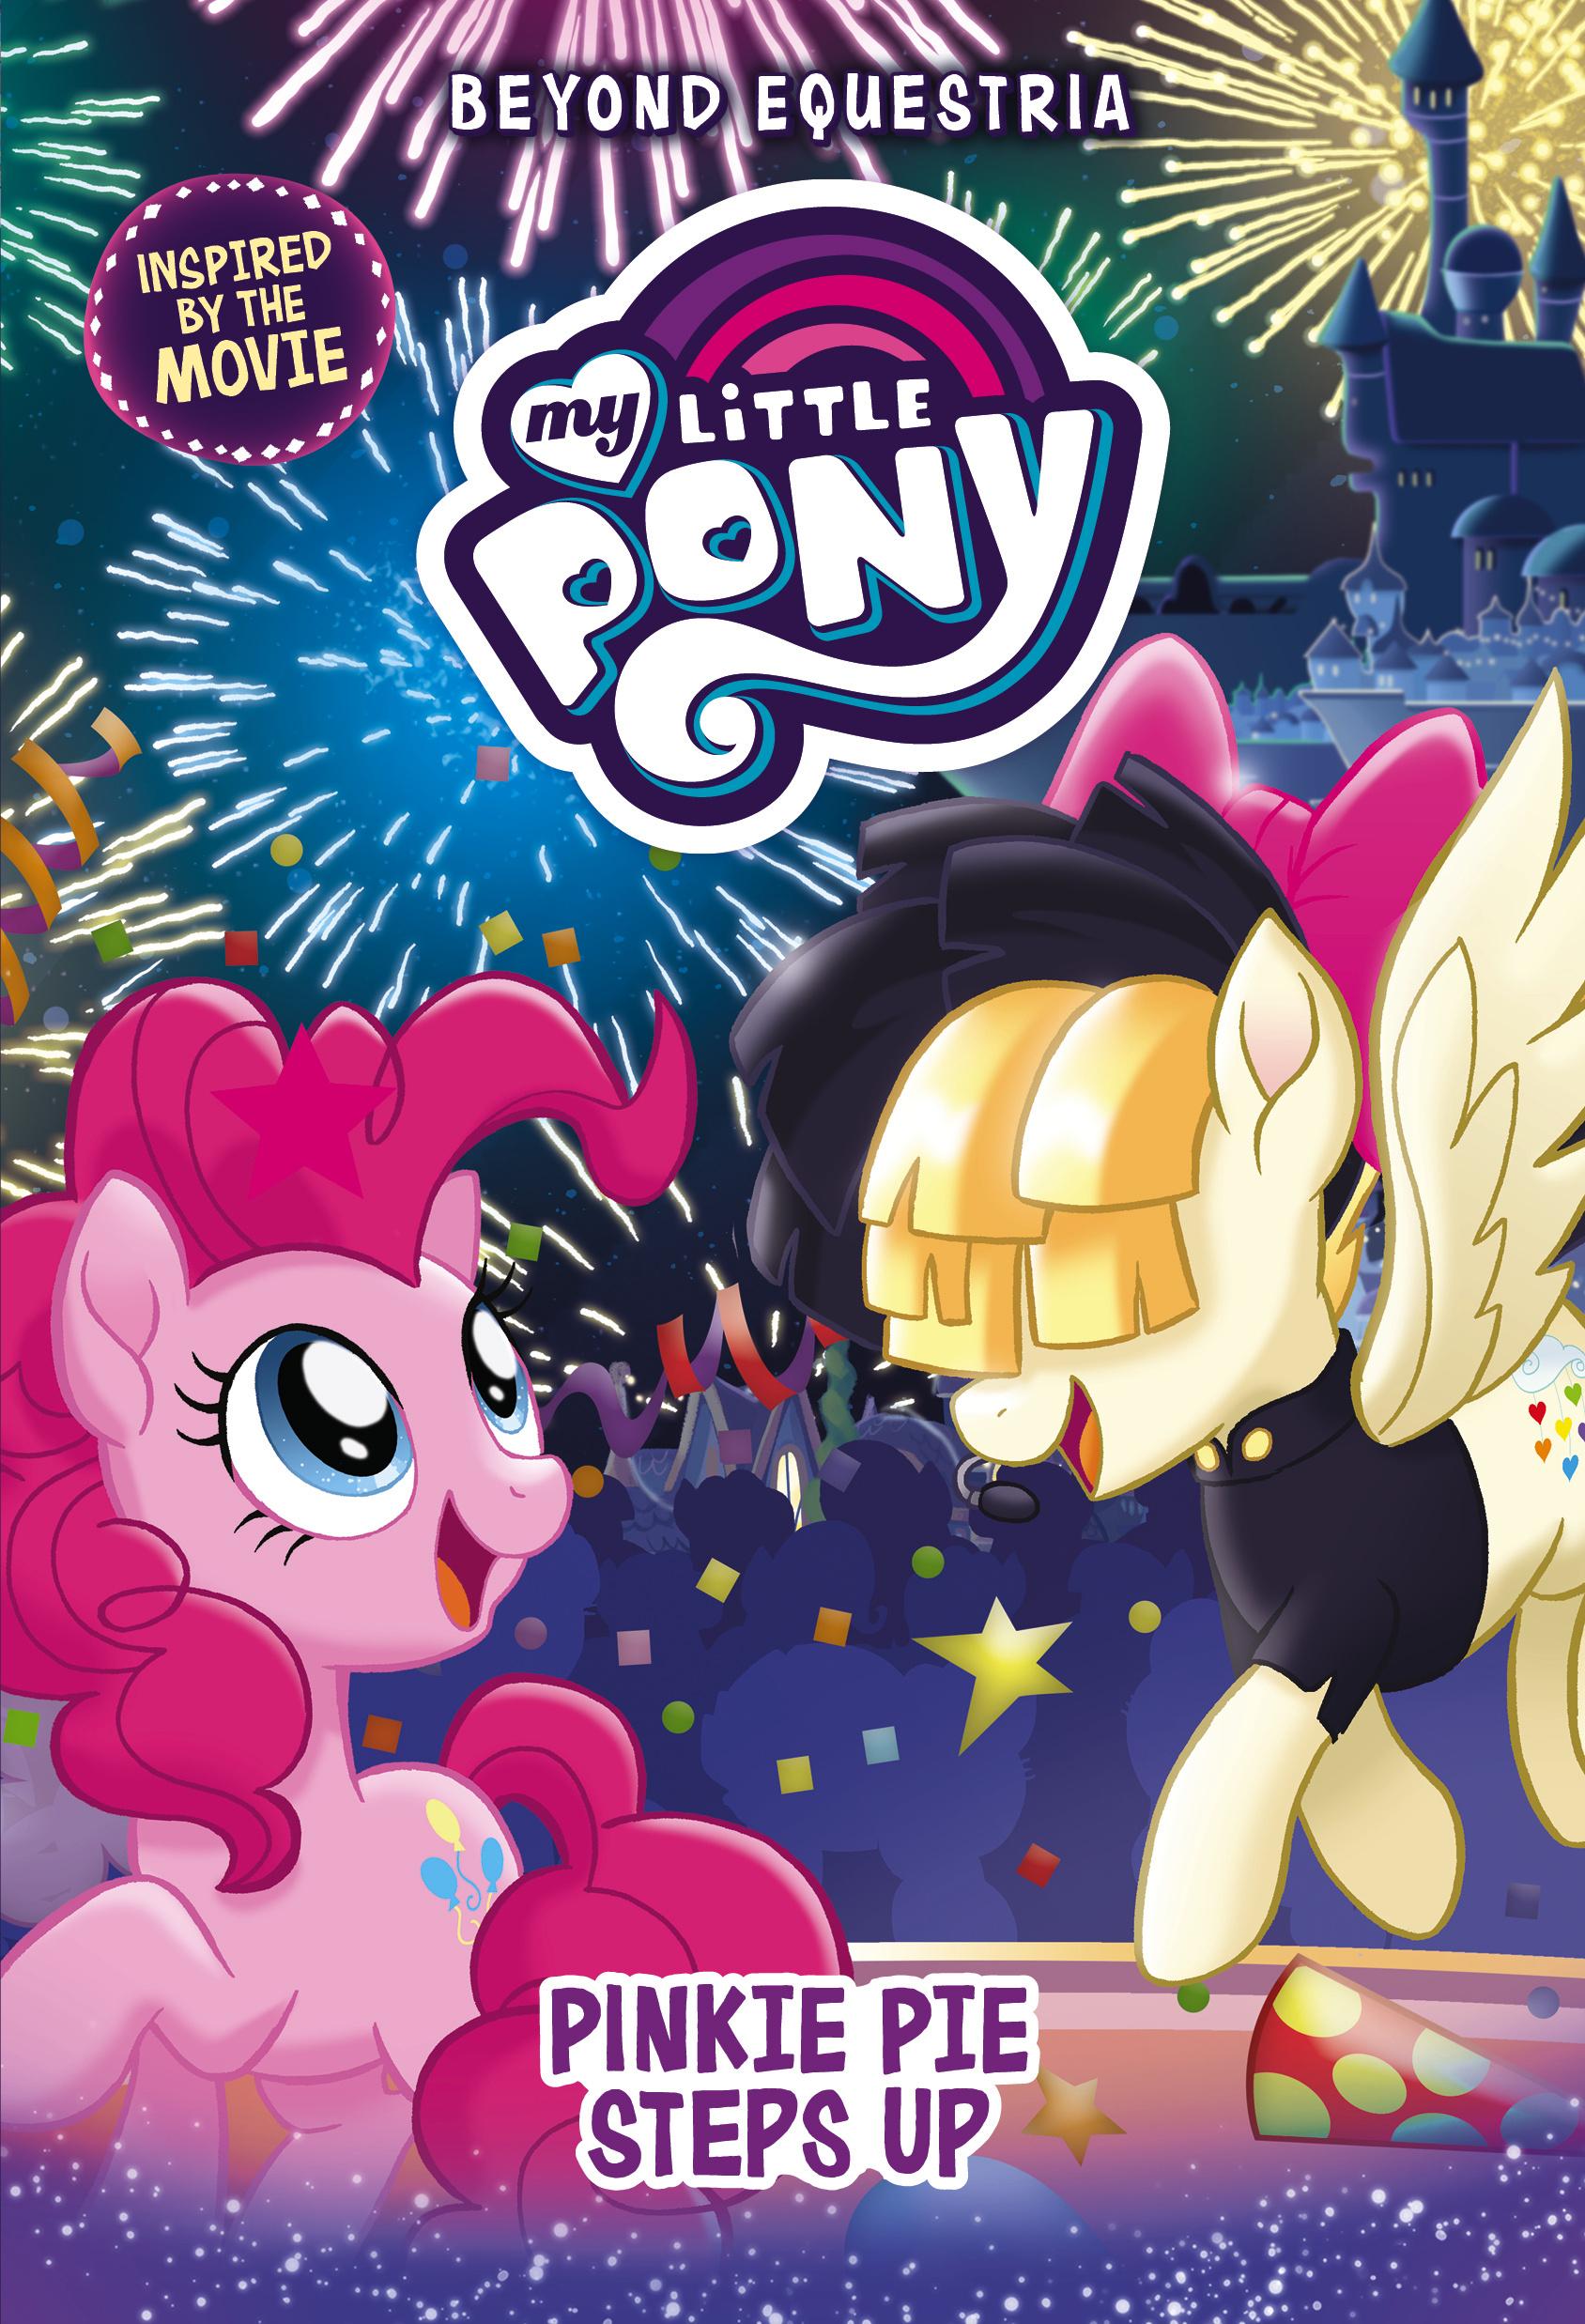 Beyond Equestria: Pinkie Pie Steps Up